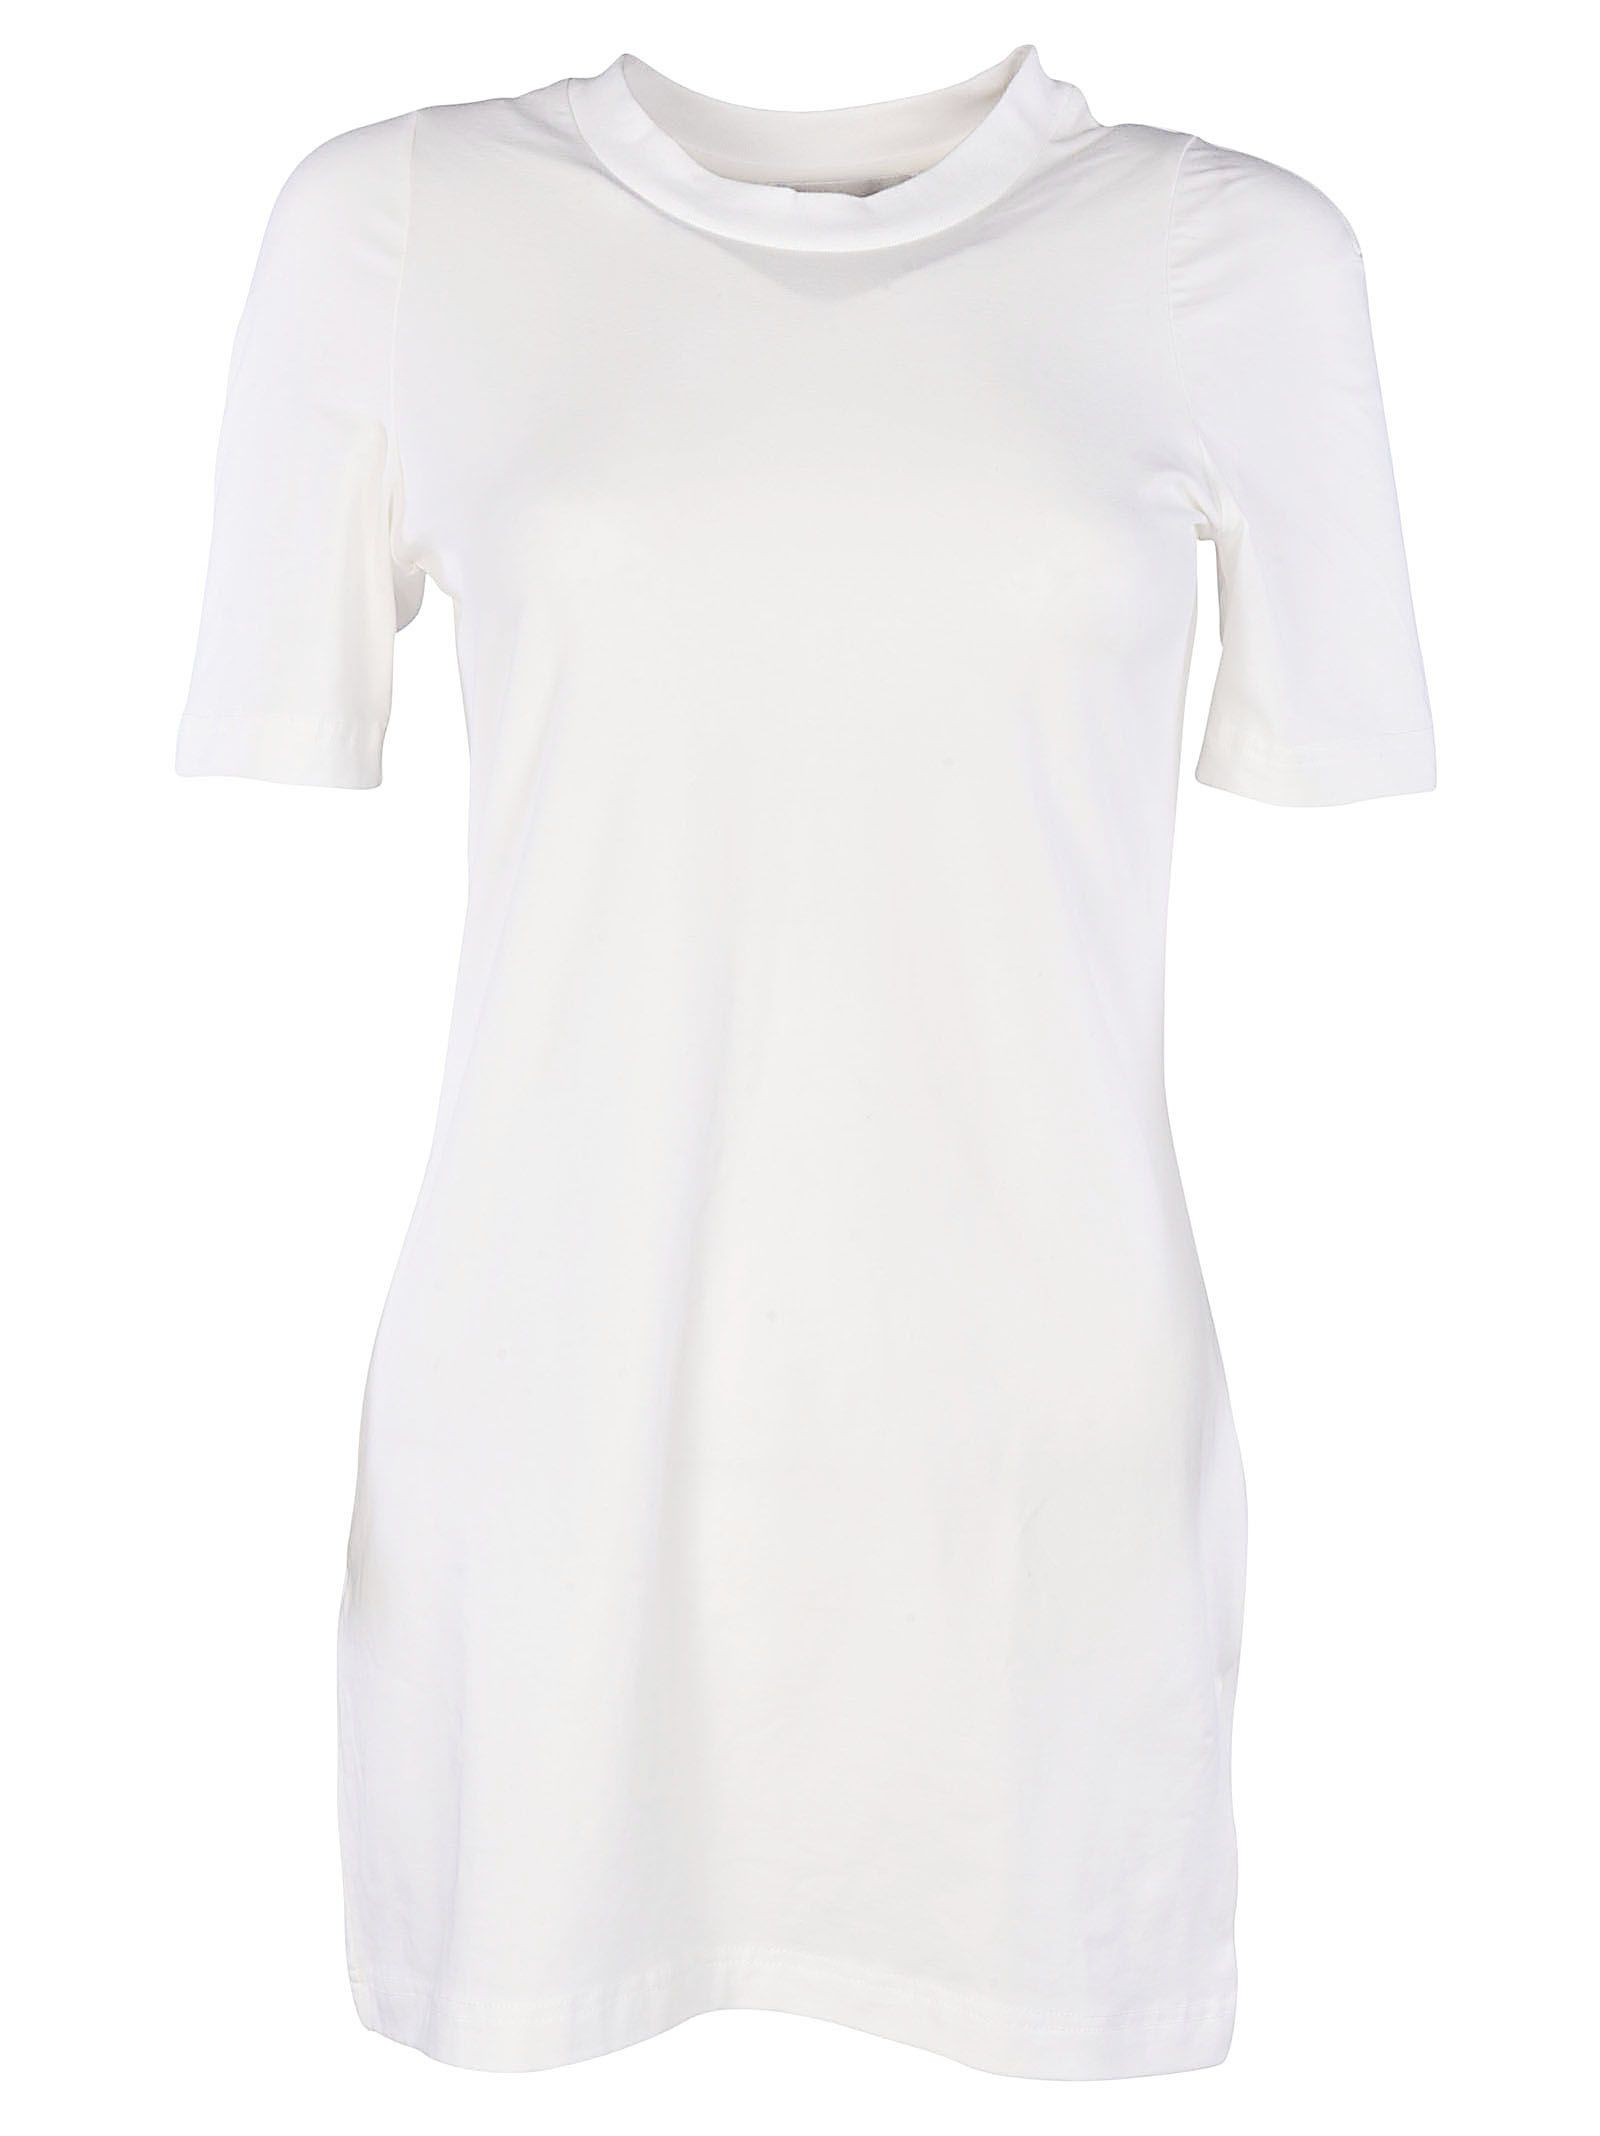 Y-3 Crew Neck T-shirt